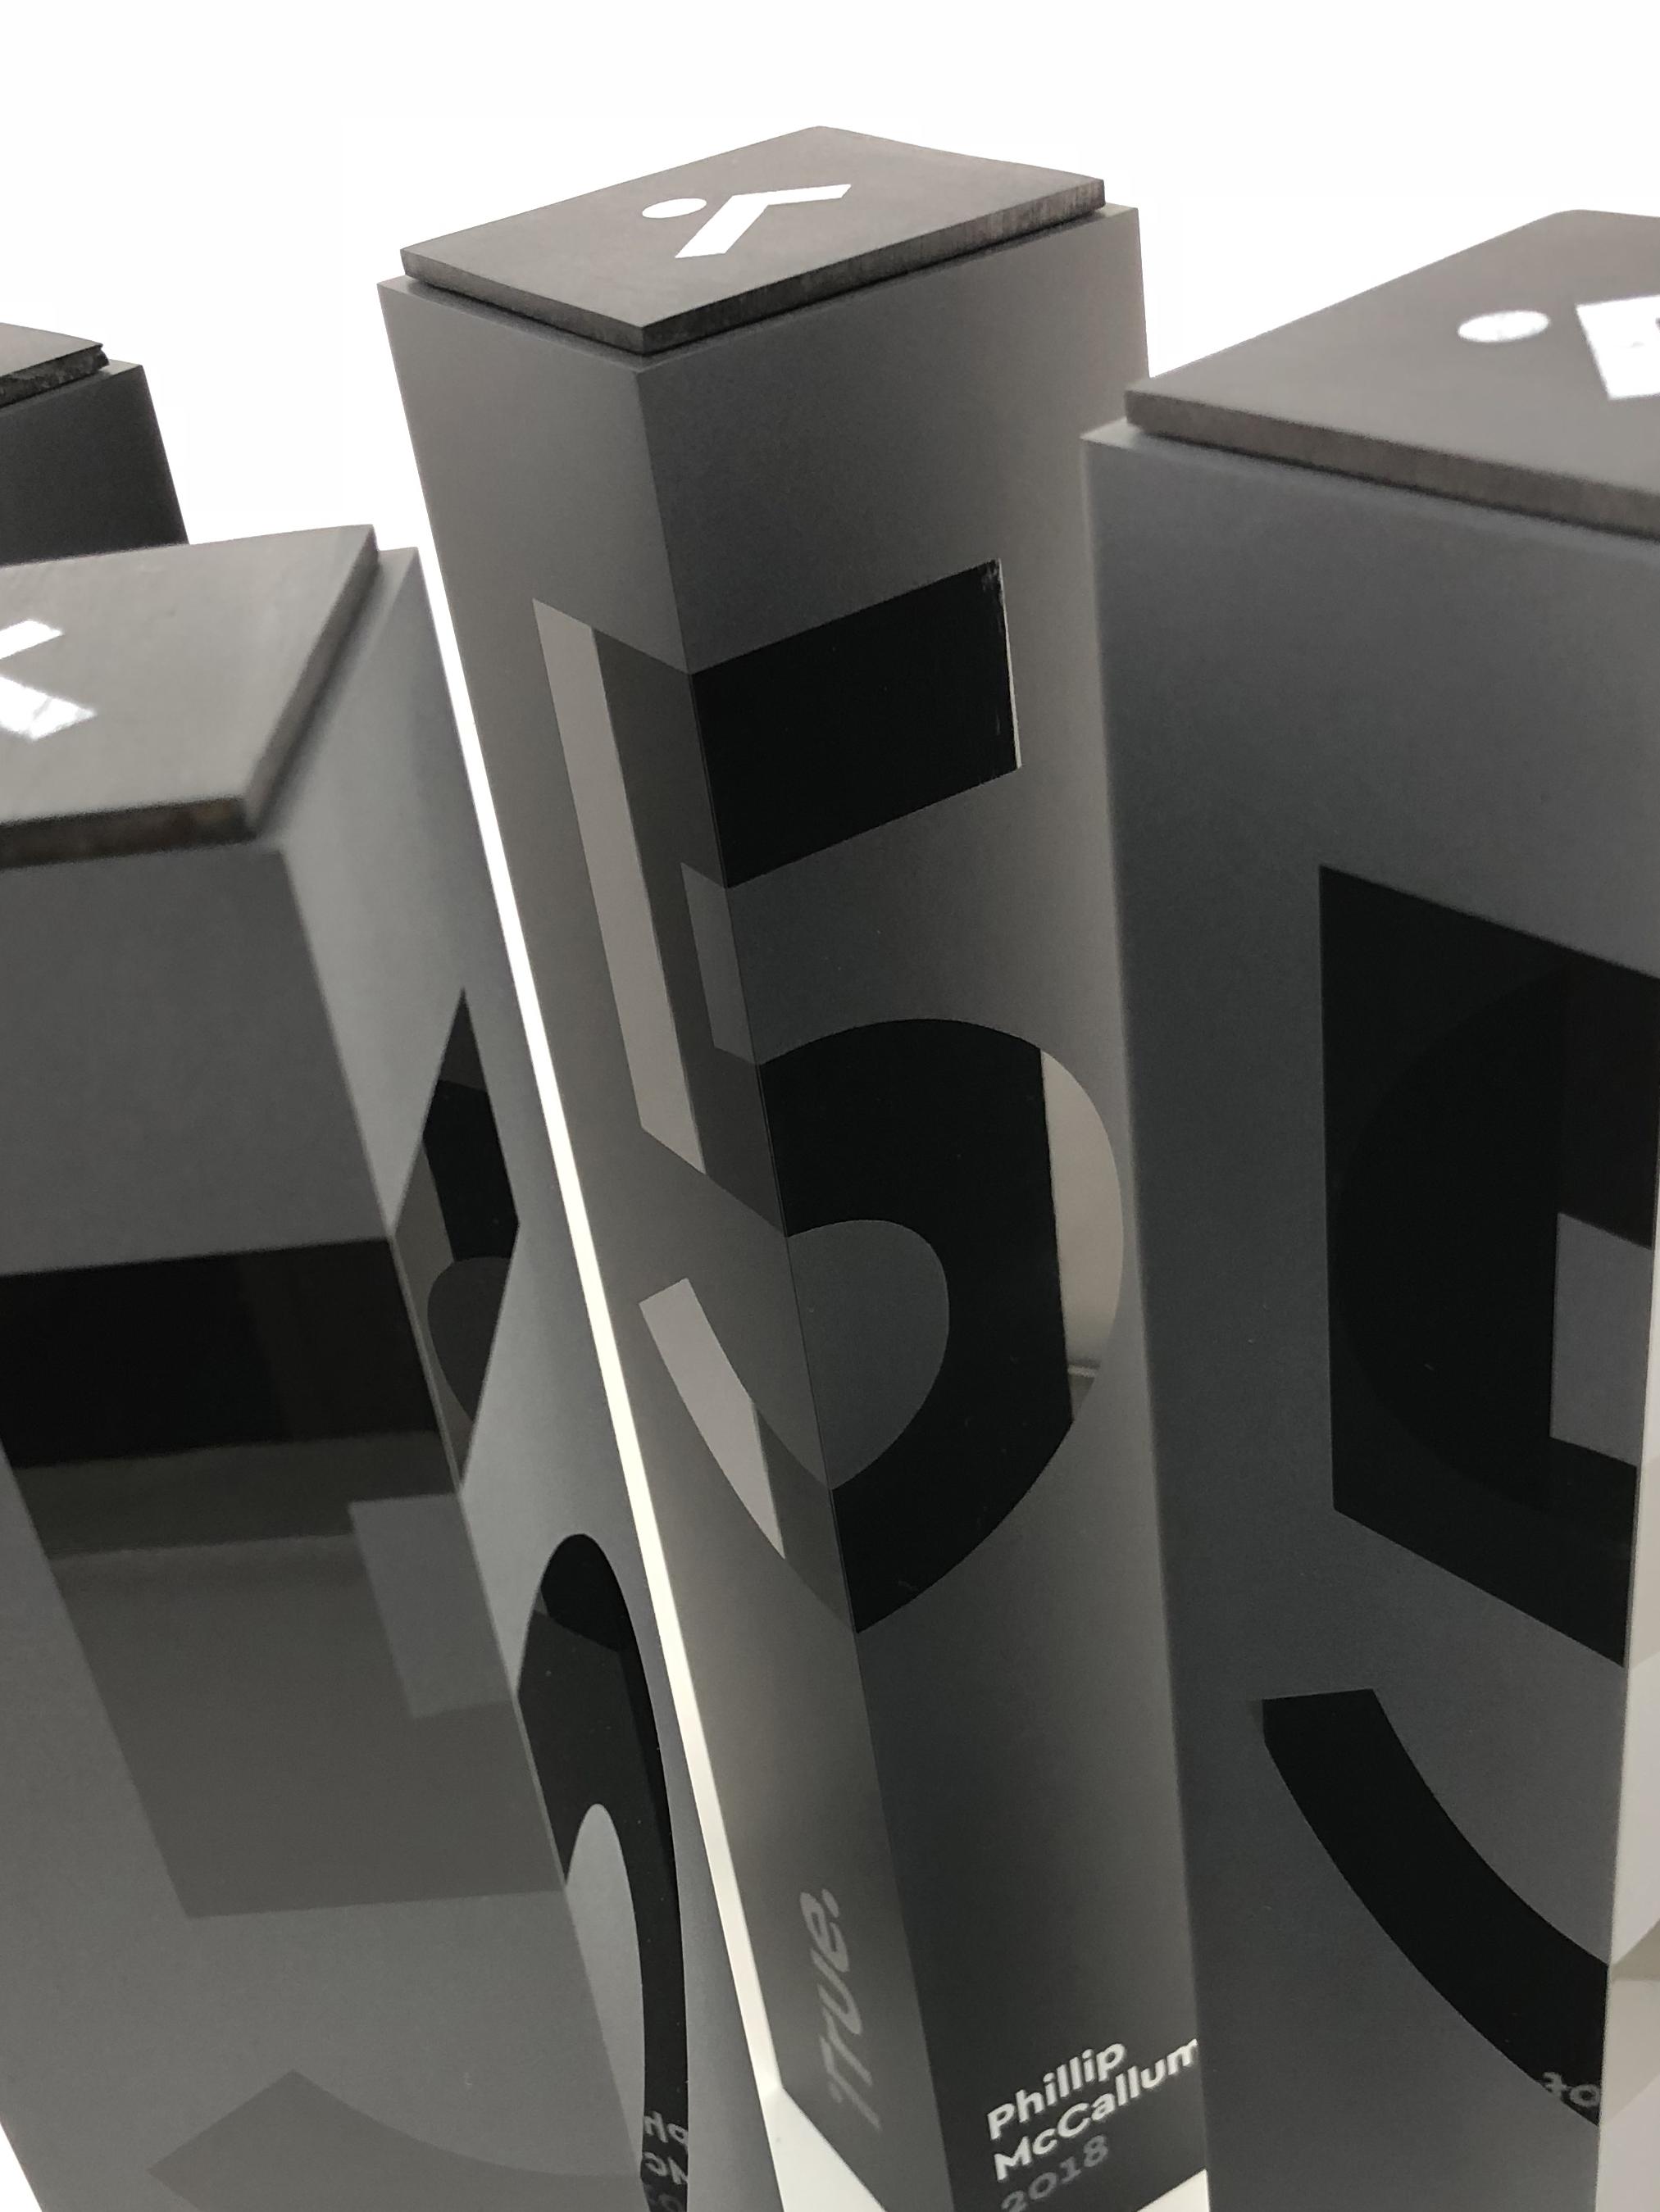 true-black-acrylic-etched-awards-trophy-06.jpg